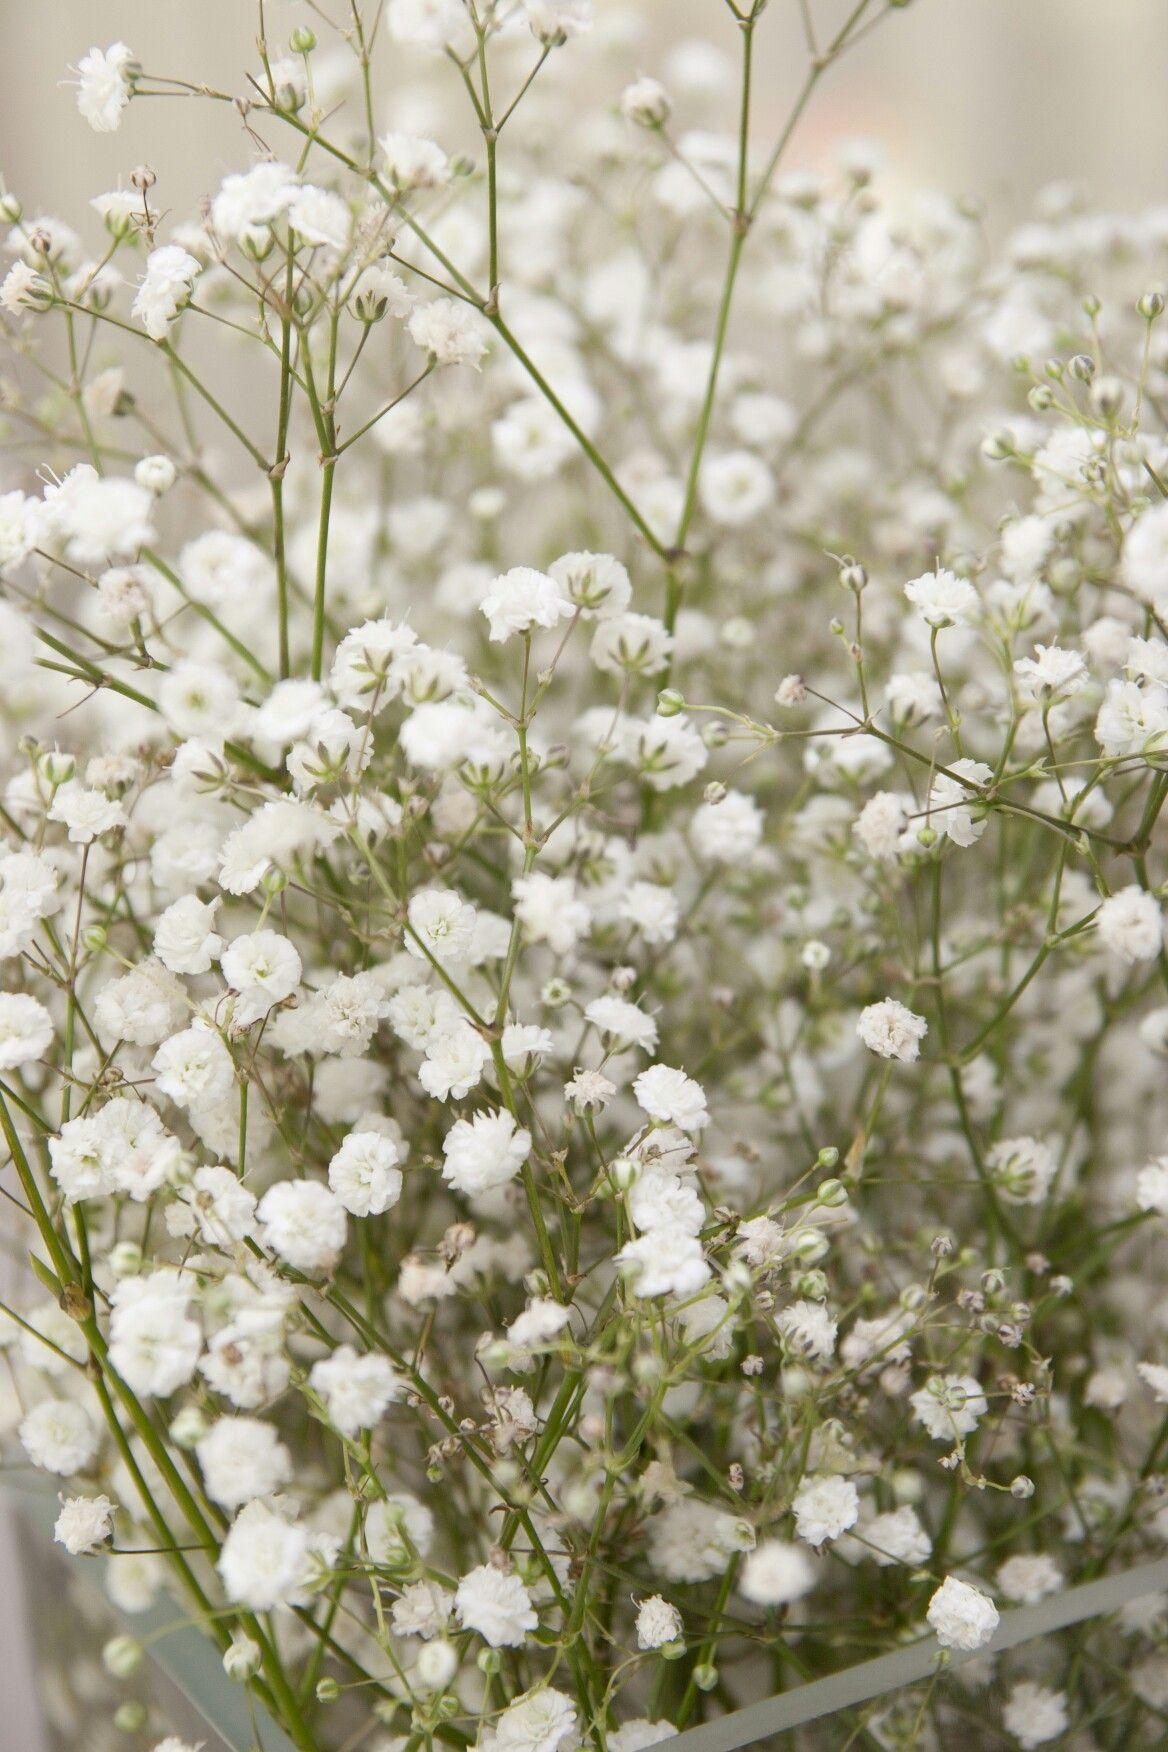 Pin By Katie Hayes On Flower Baby S Breath Plant Babys Breath Flowers Gypsophila